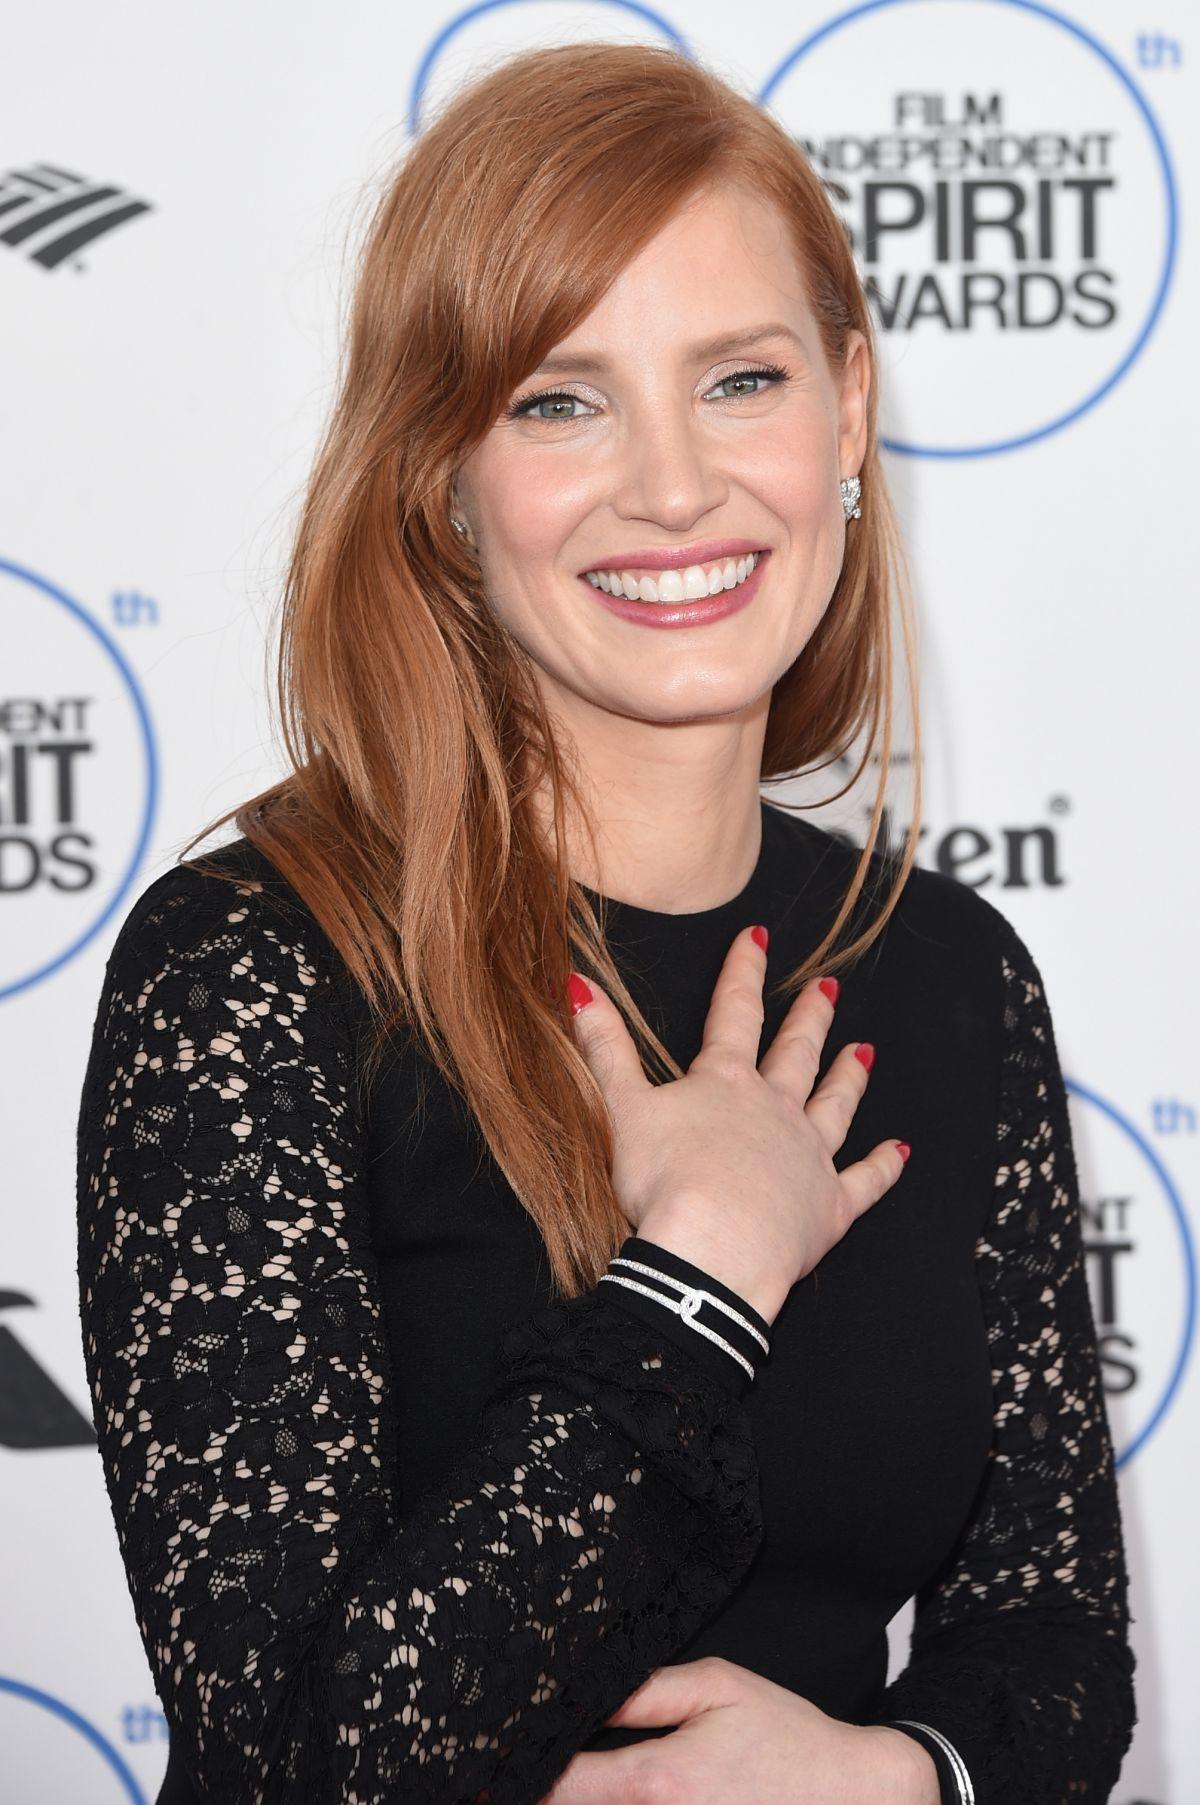 JESSICA CHASTAIN at 2015 Film Independent Spirit Awards in Santa Monica